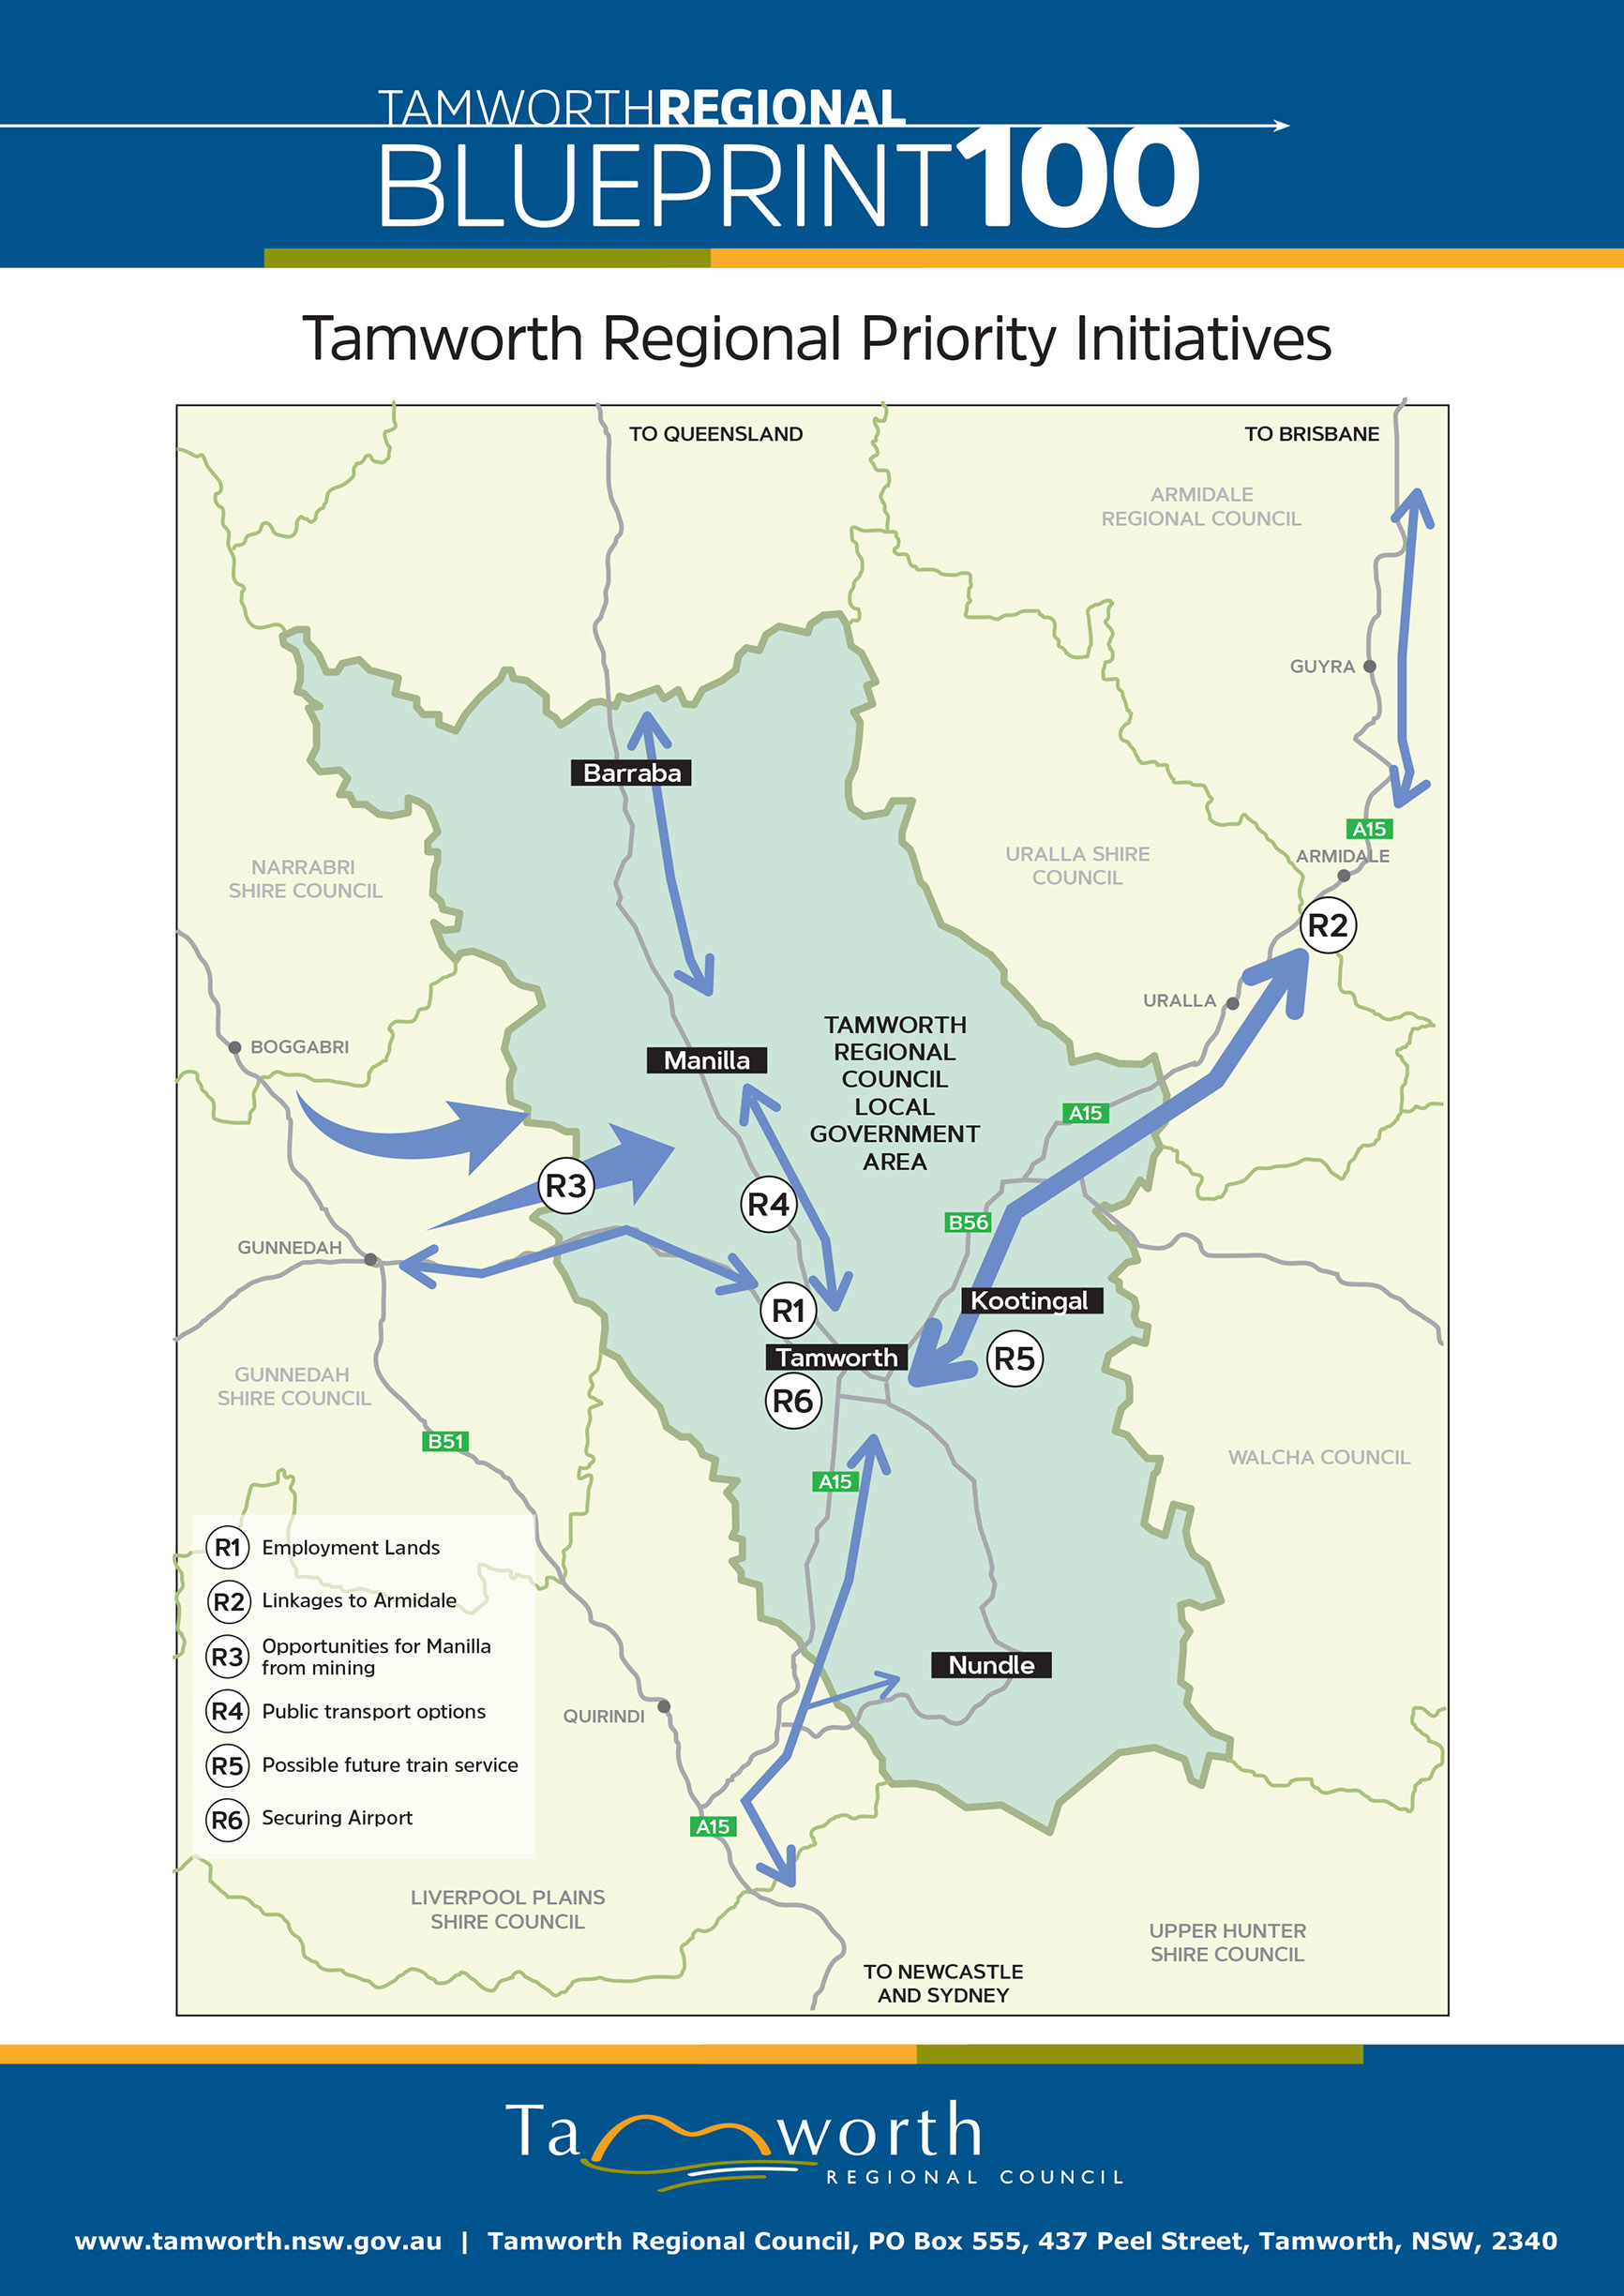 Tamworth Regional Priority Initiatives